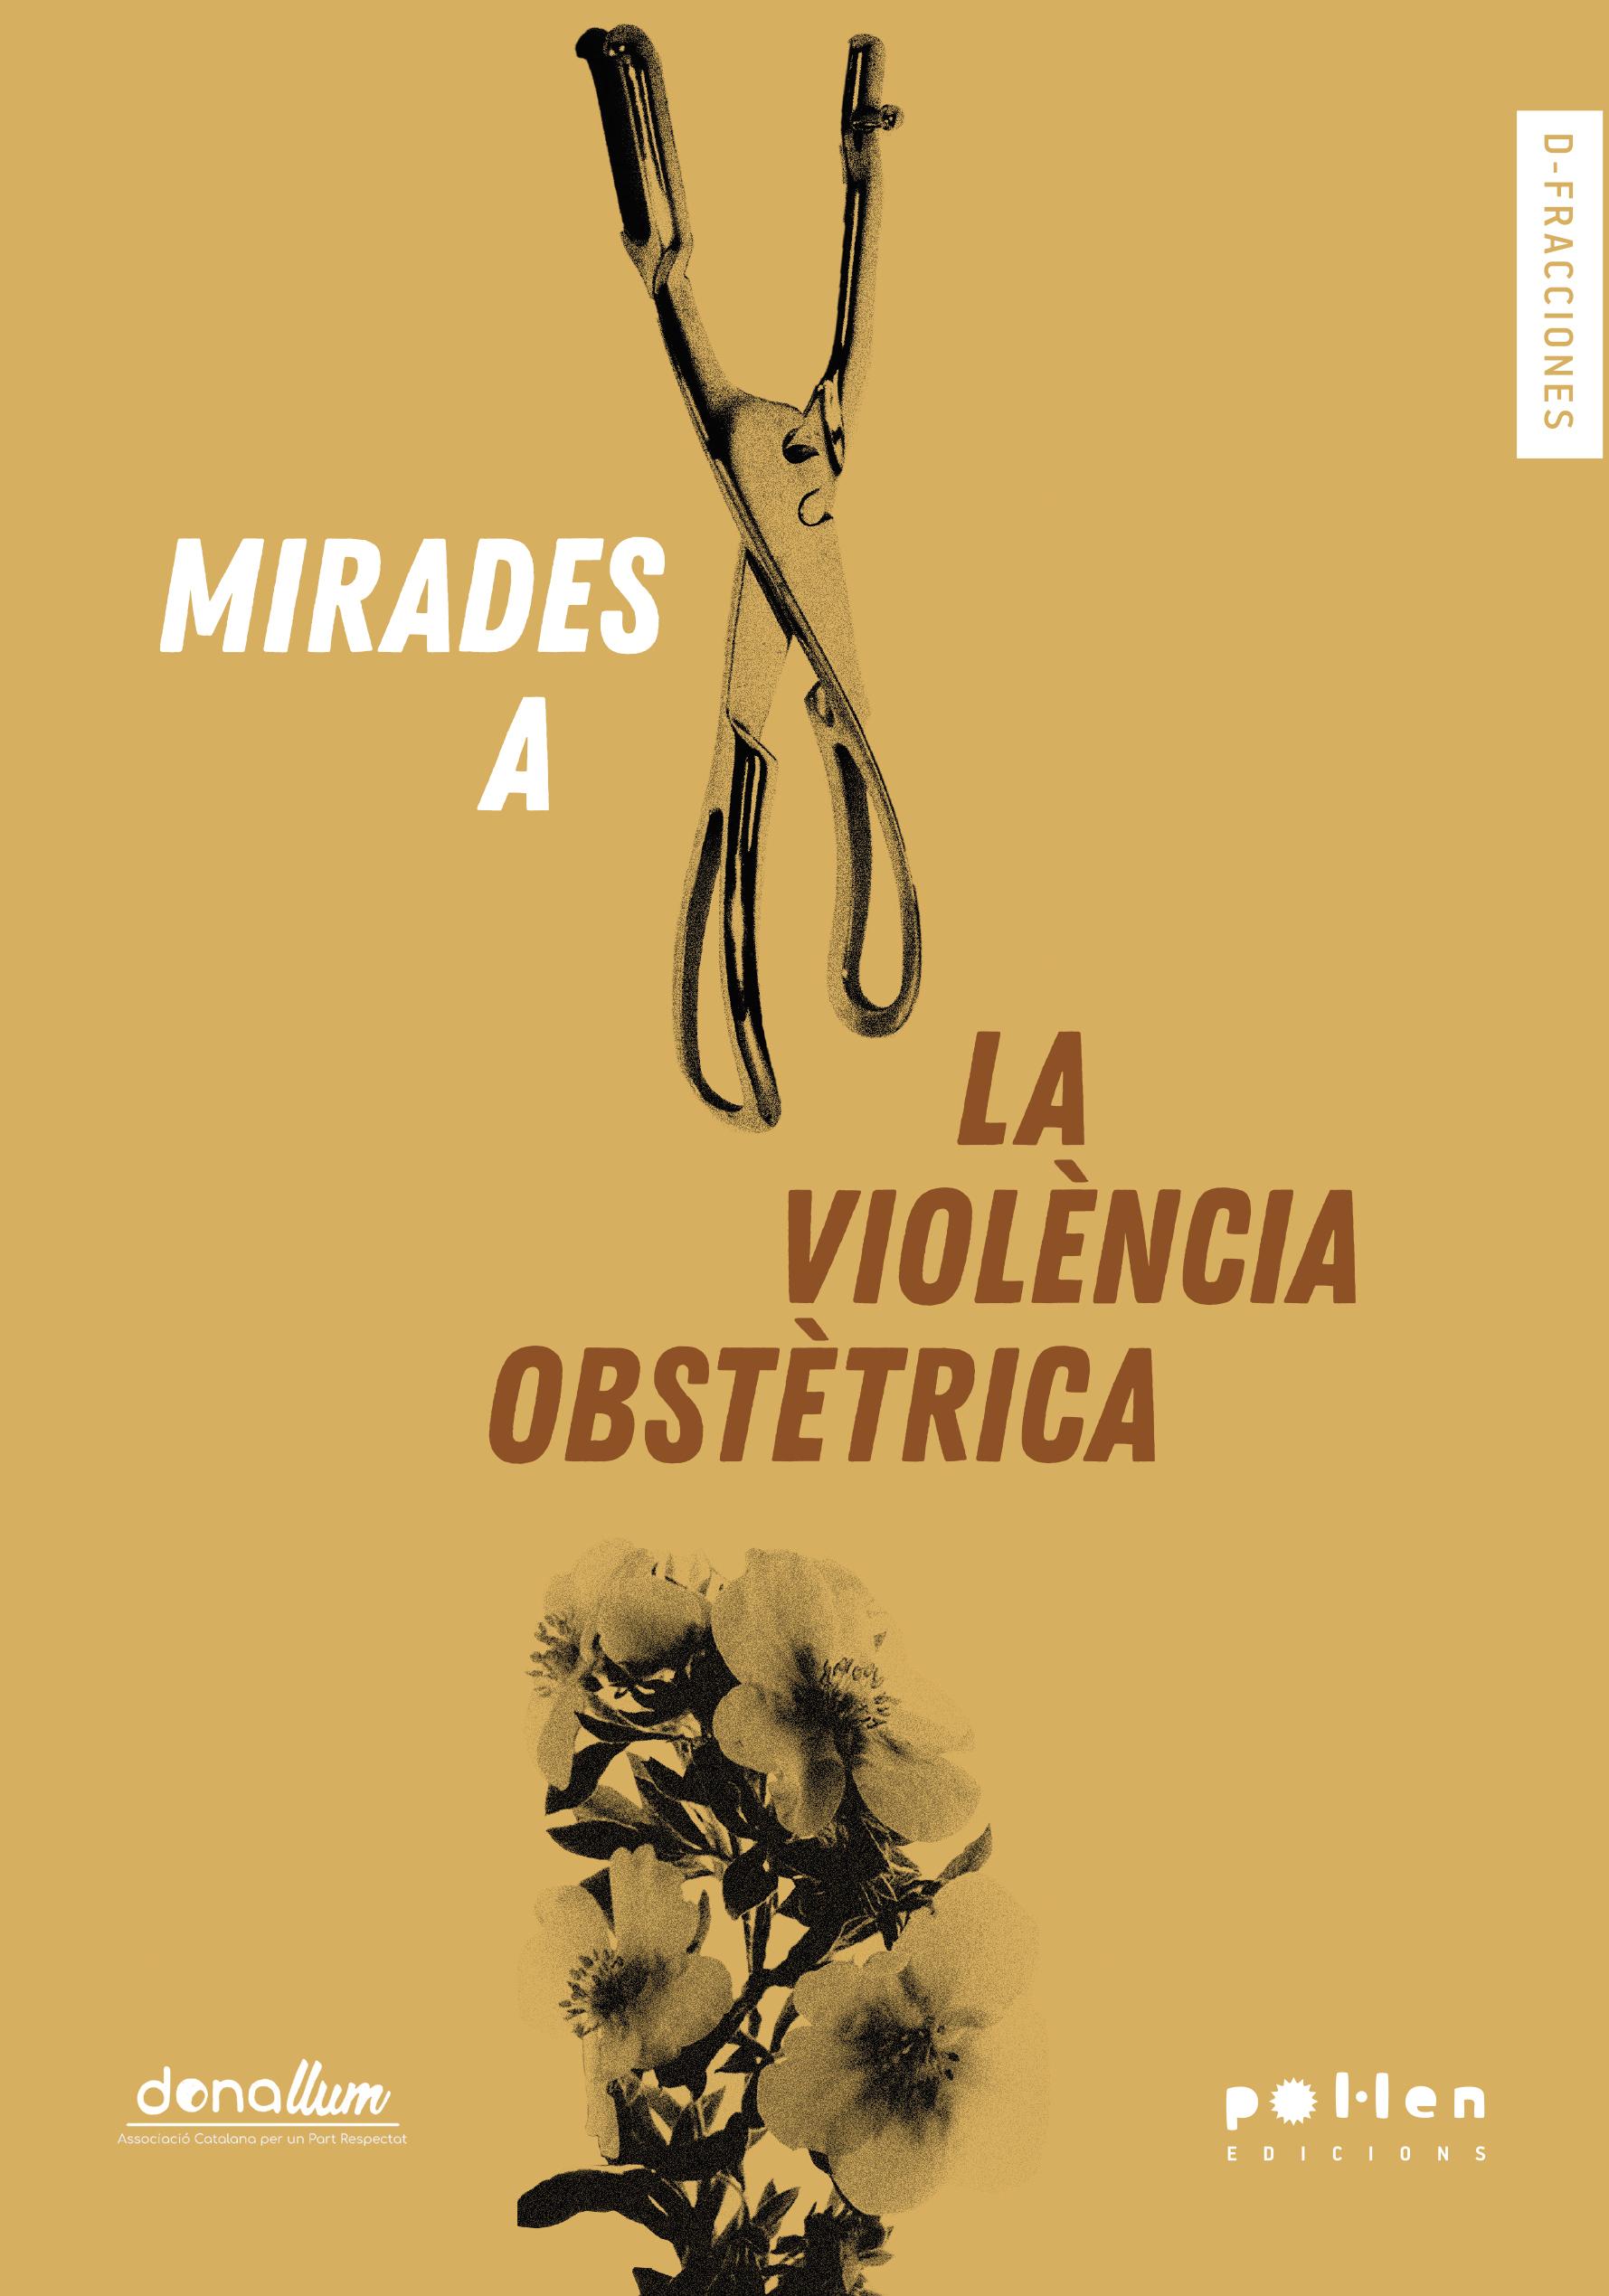 Mirades_violències_obstètricas_Coberta_web.jpg